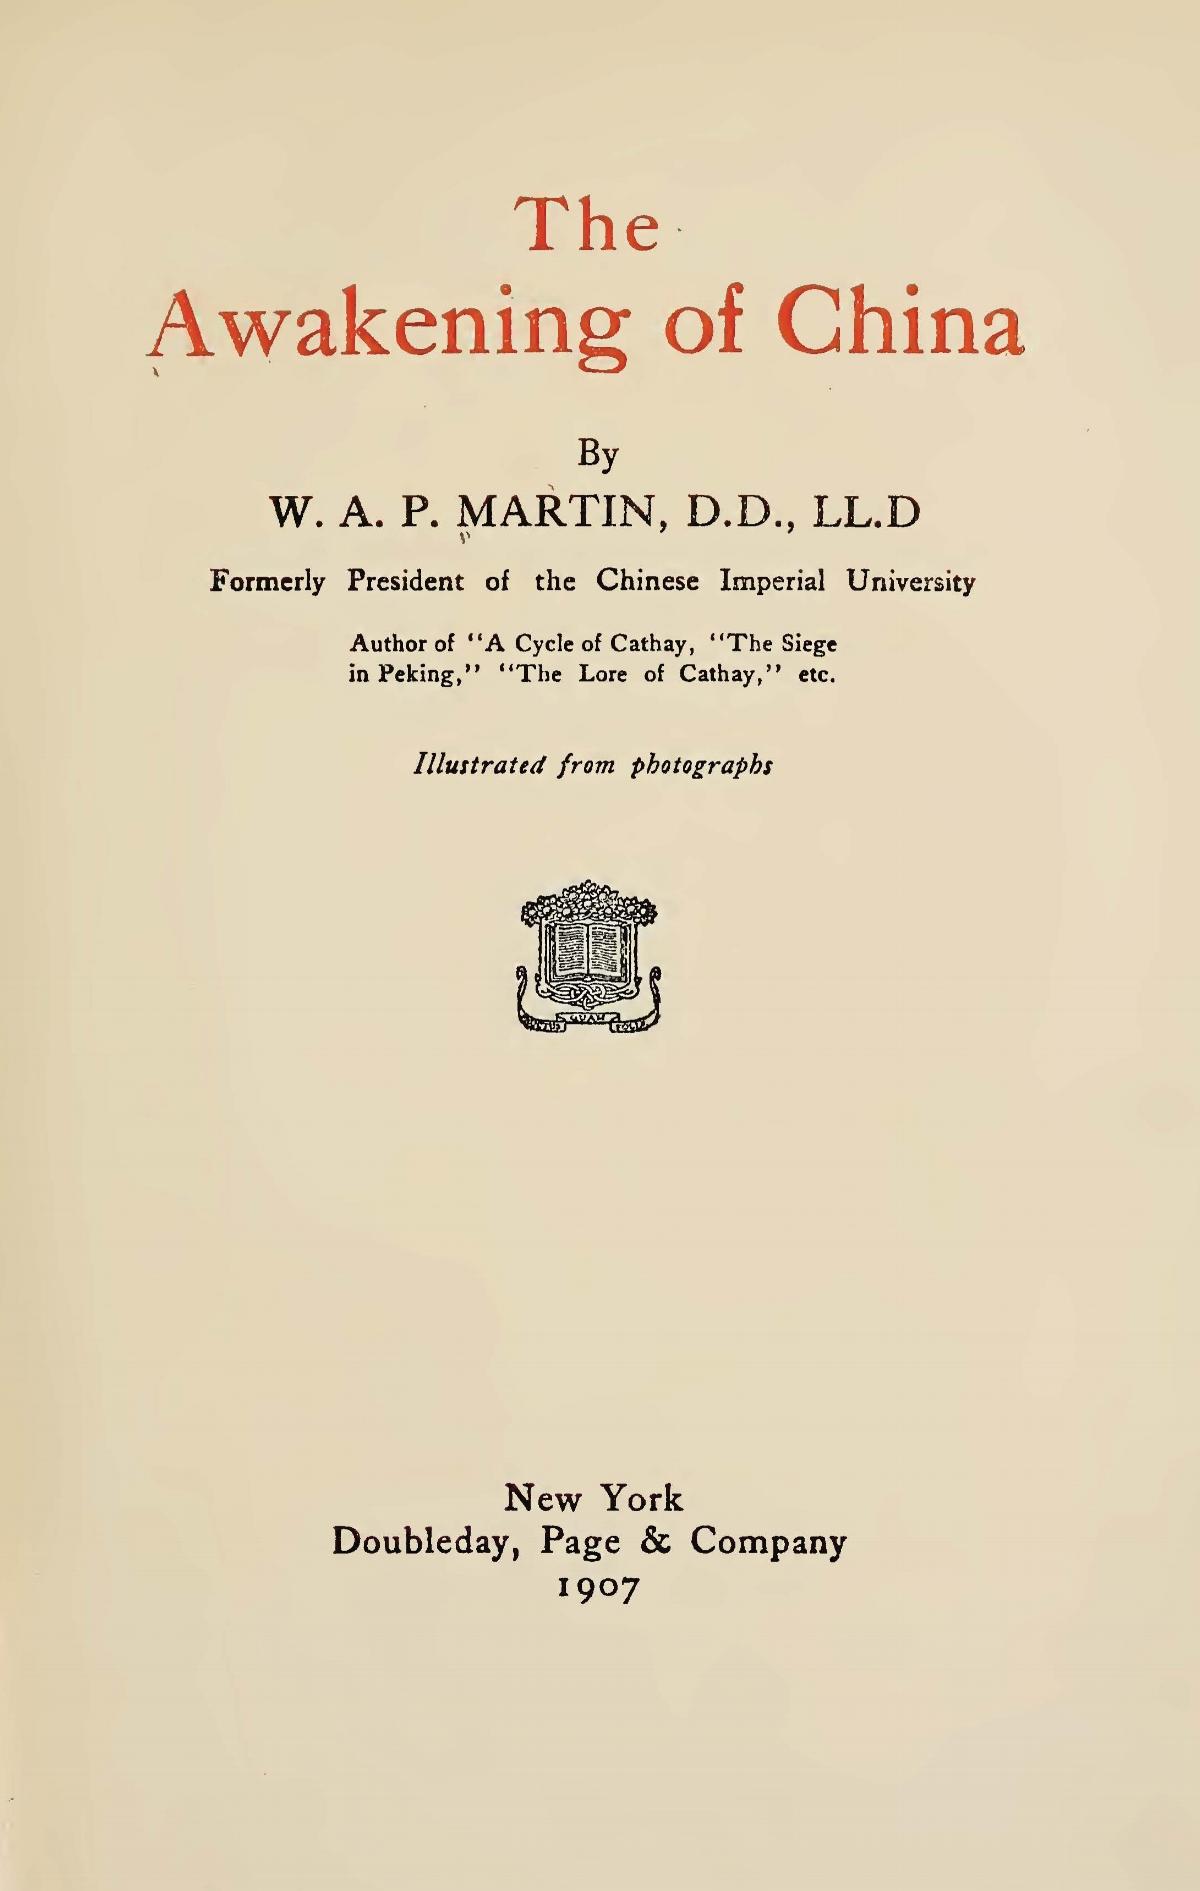 Martin, William Alexander Parsons, The Awakening of China Title Page.jpg